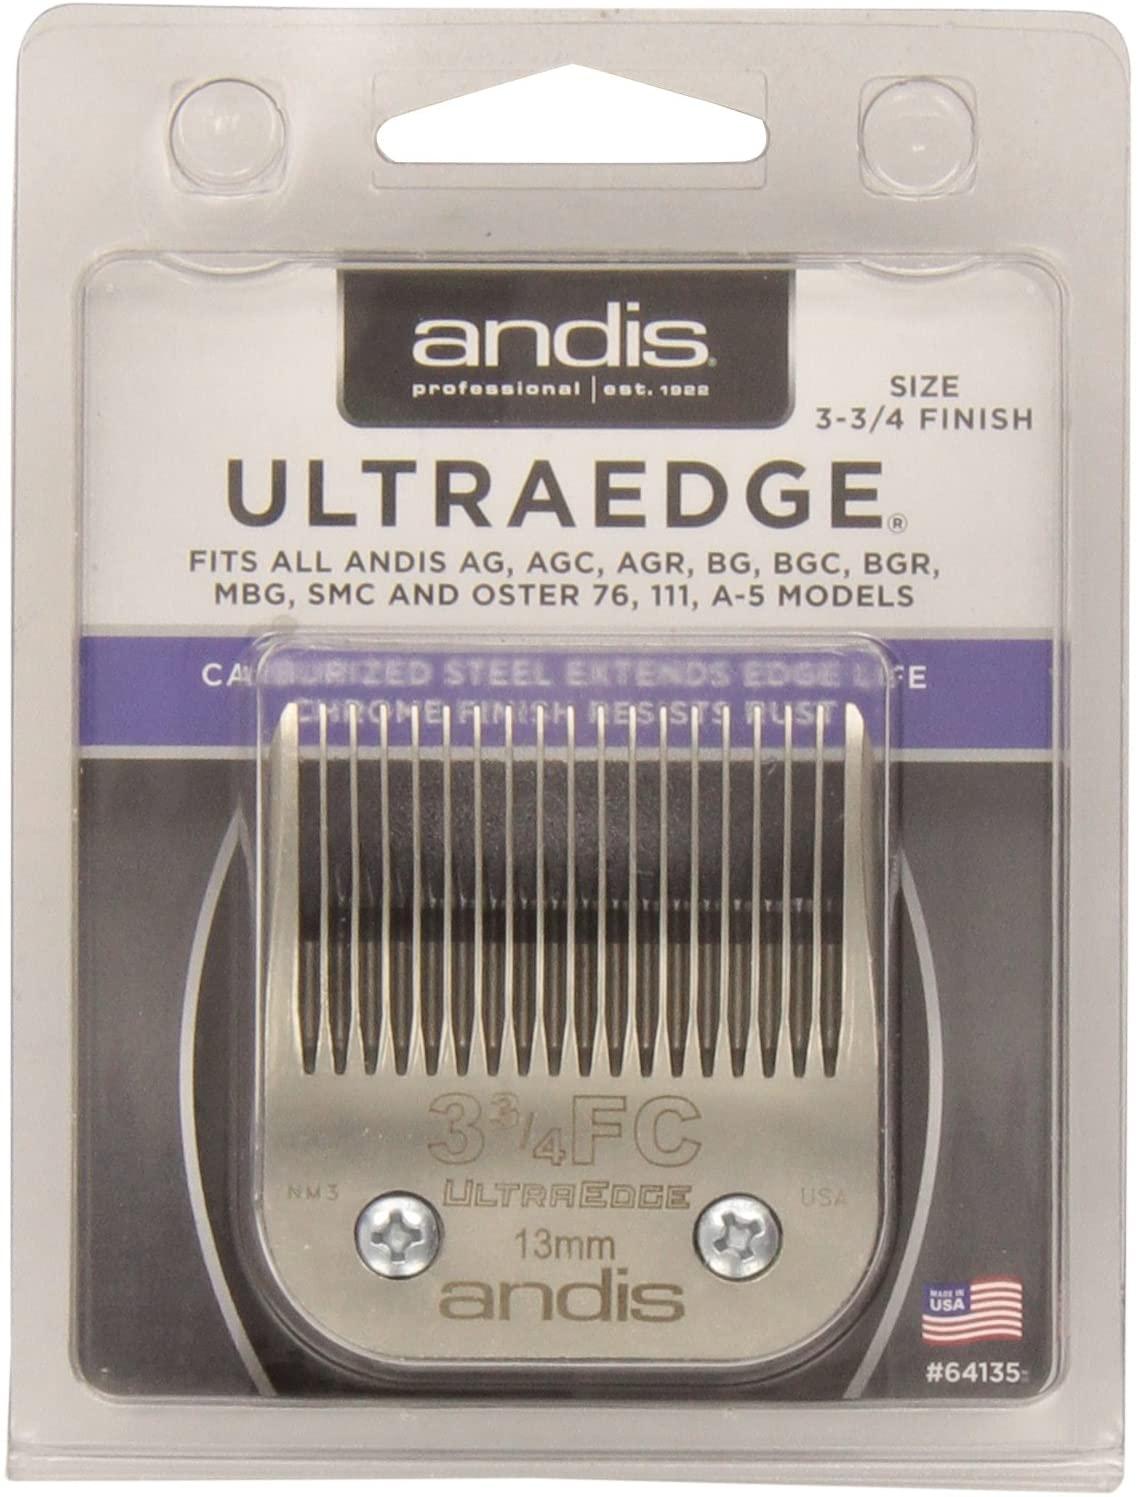 Andis UltraEdge 13 mm Schneidkopf 2